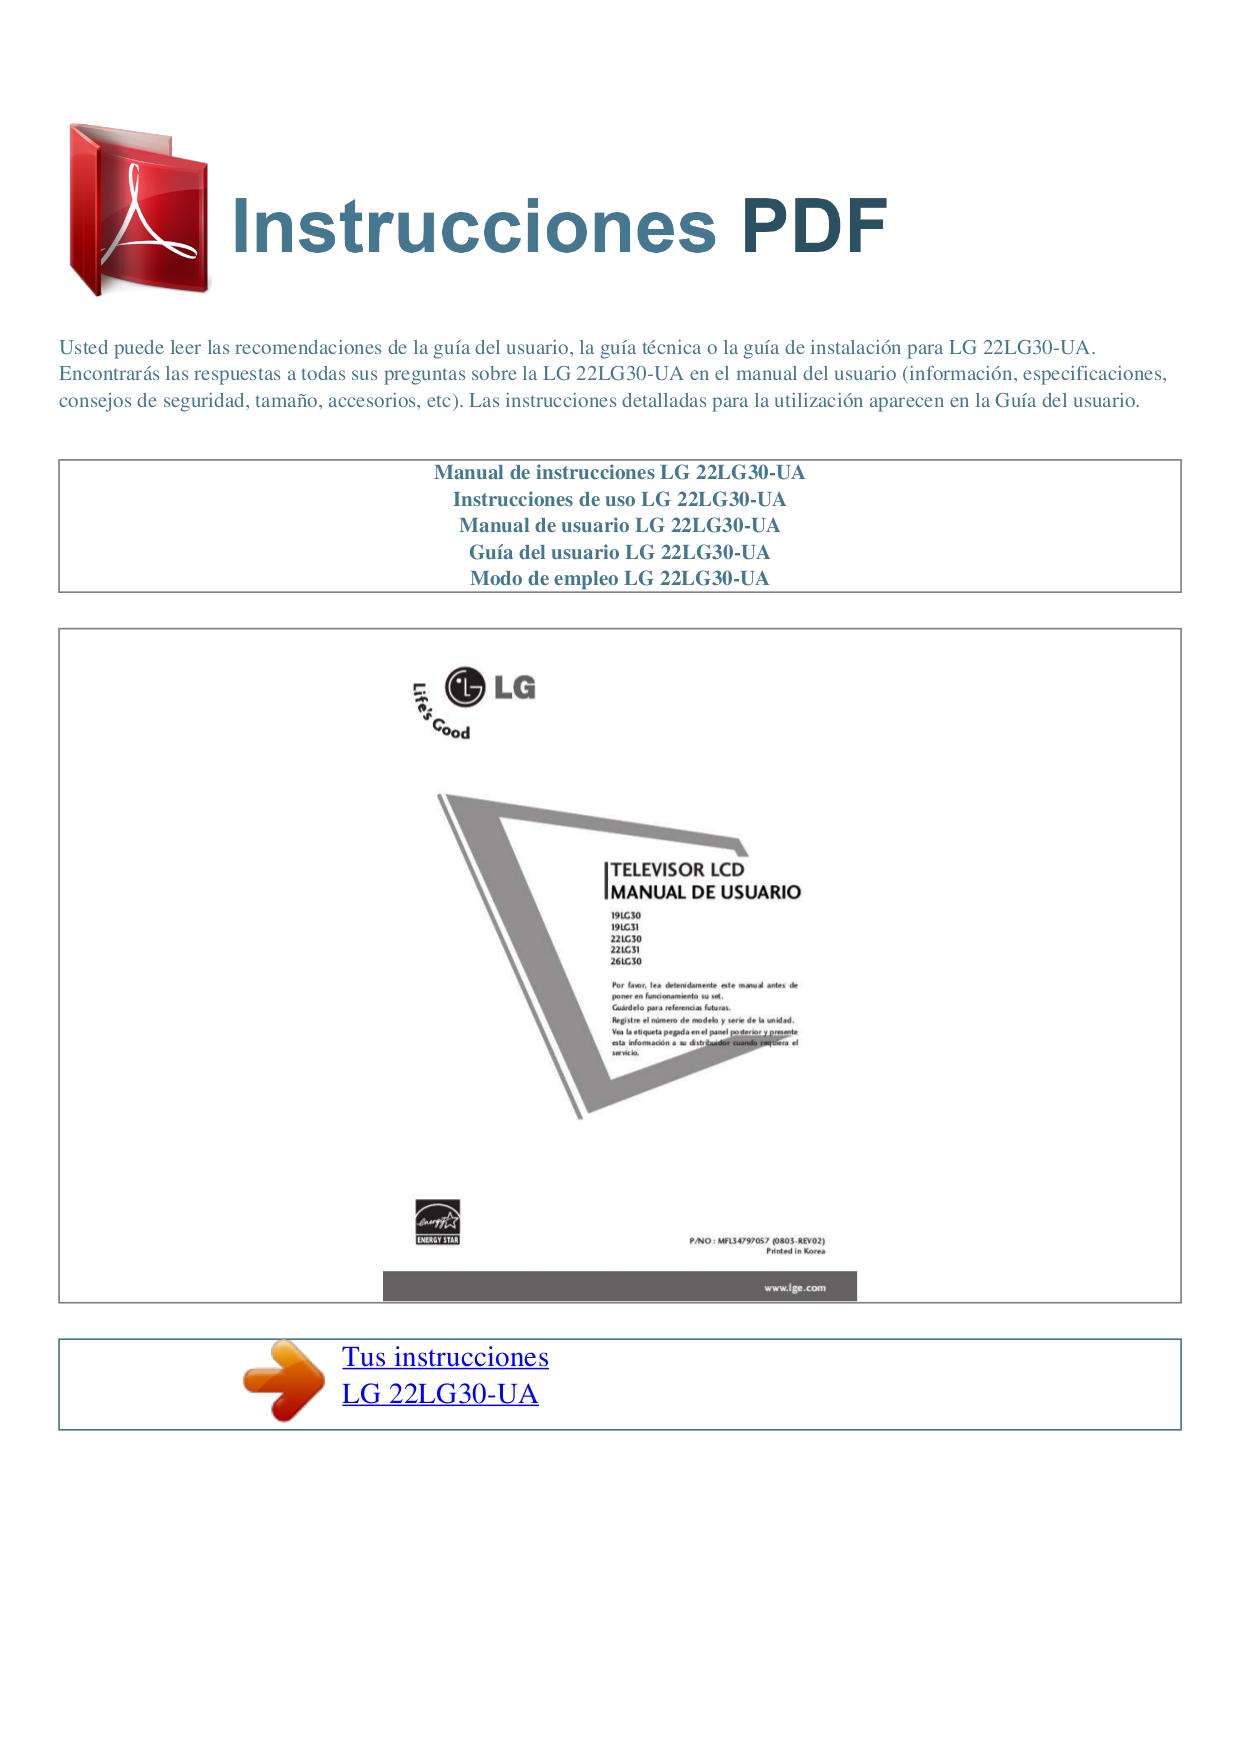 Download Free Pdf For Lg 22lg30 Tv Manual Hospital Wiring Diagram